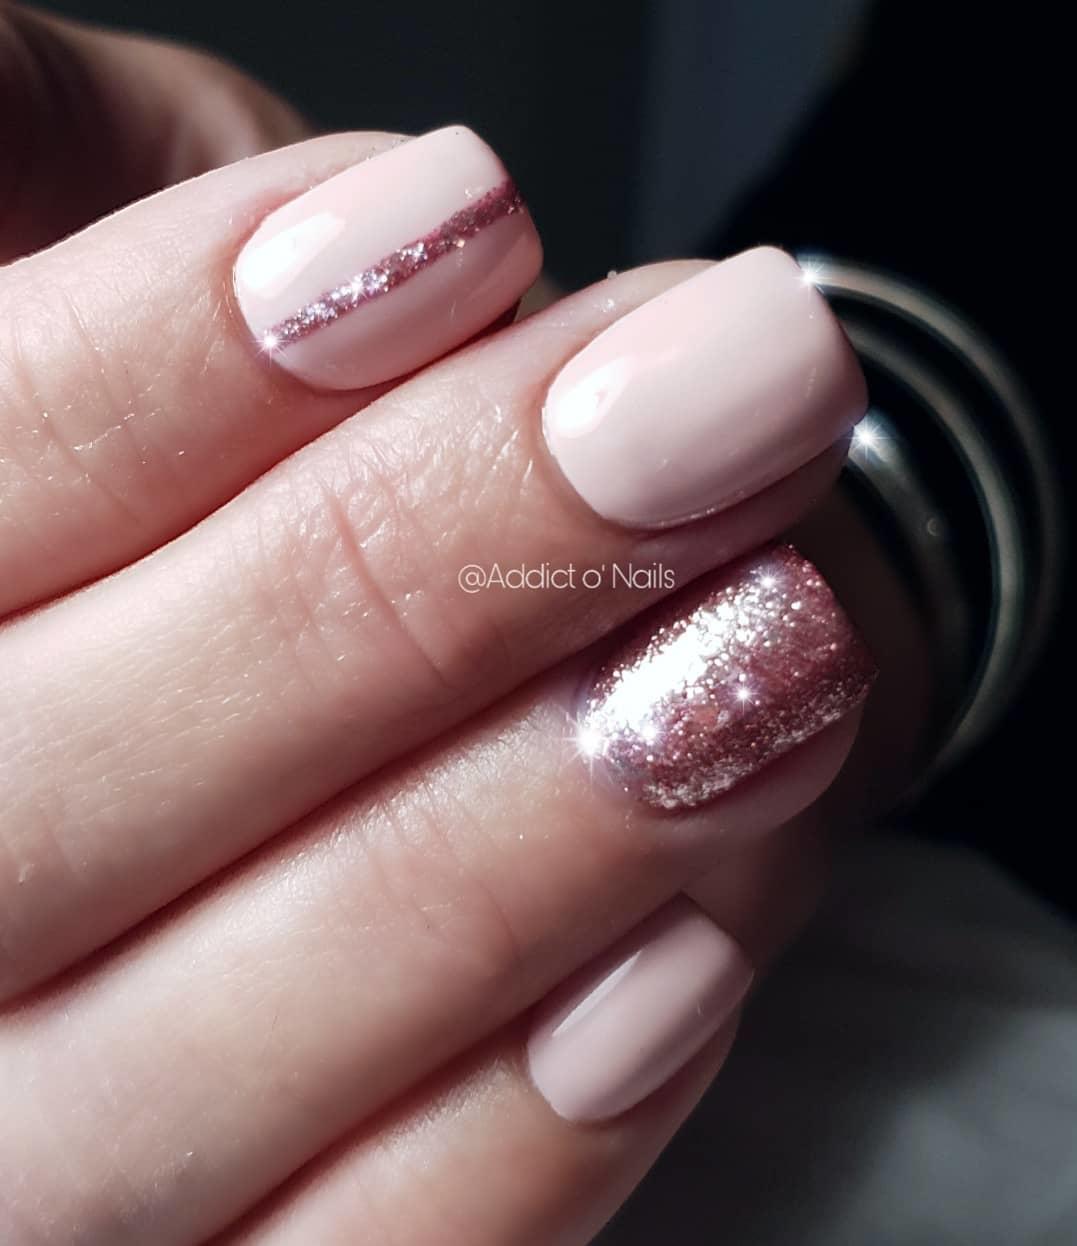 cool pink nail designs 2019 - 21 Cool Pink Nail Designs 2019